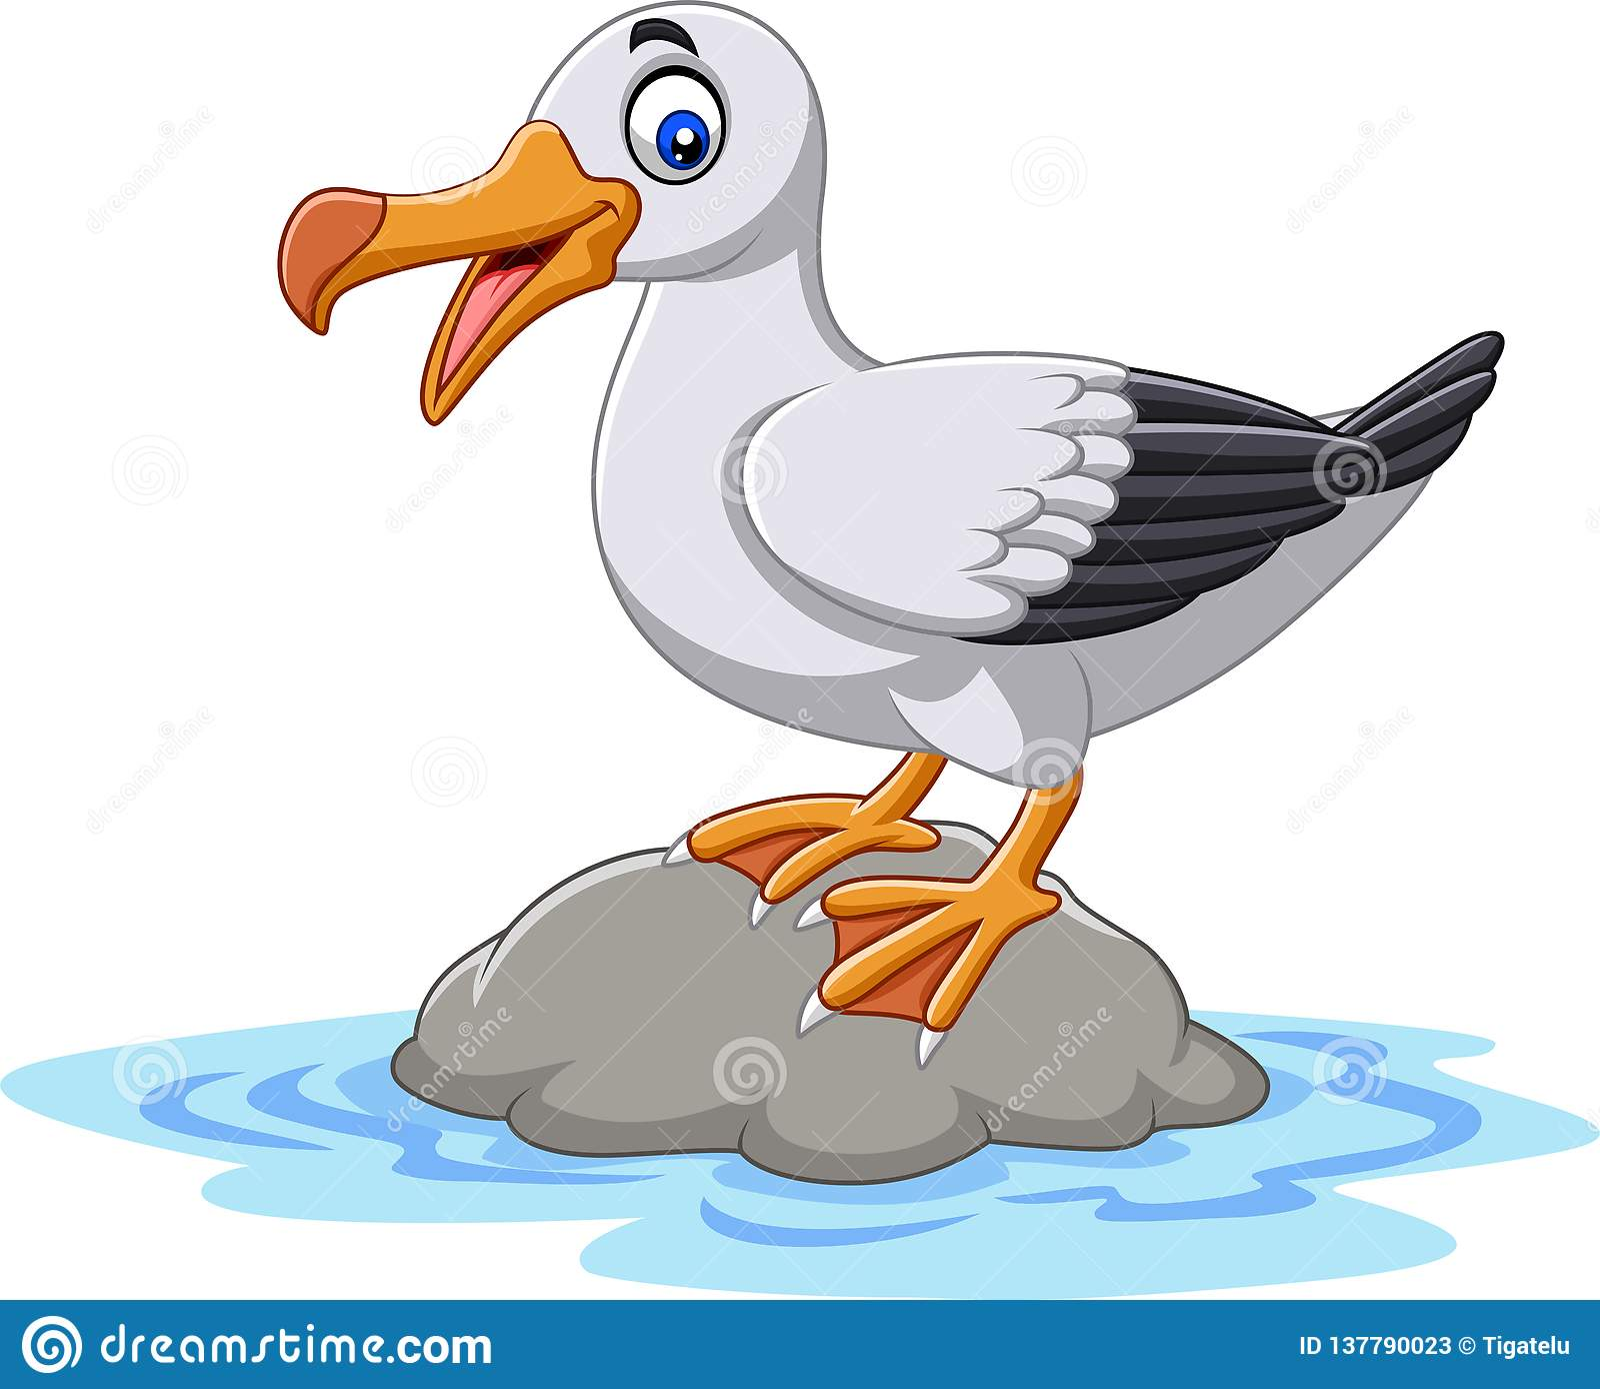 albatross cartoons illustrations amp vector stock images